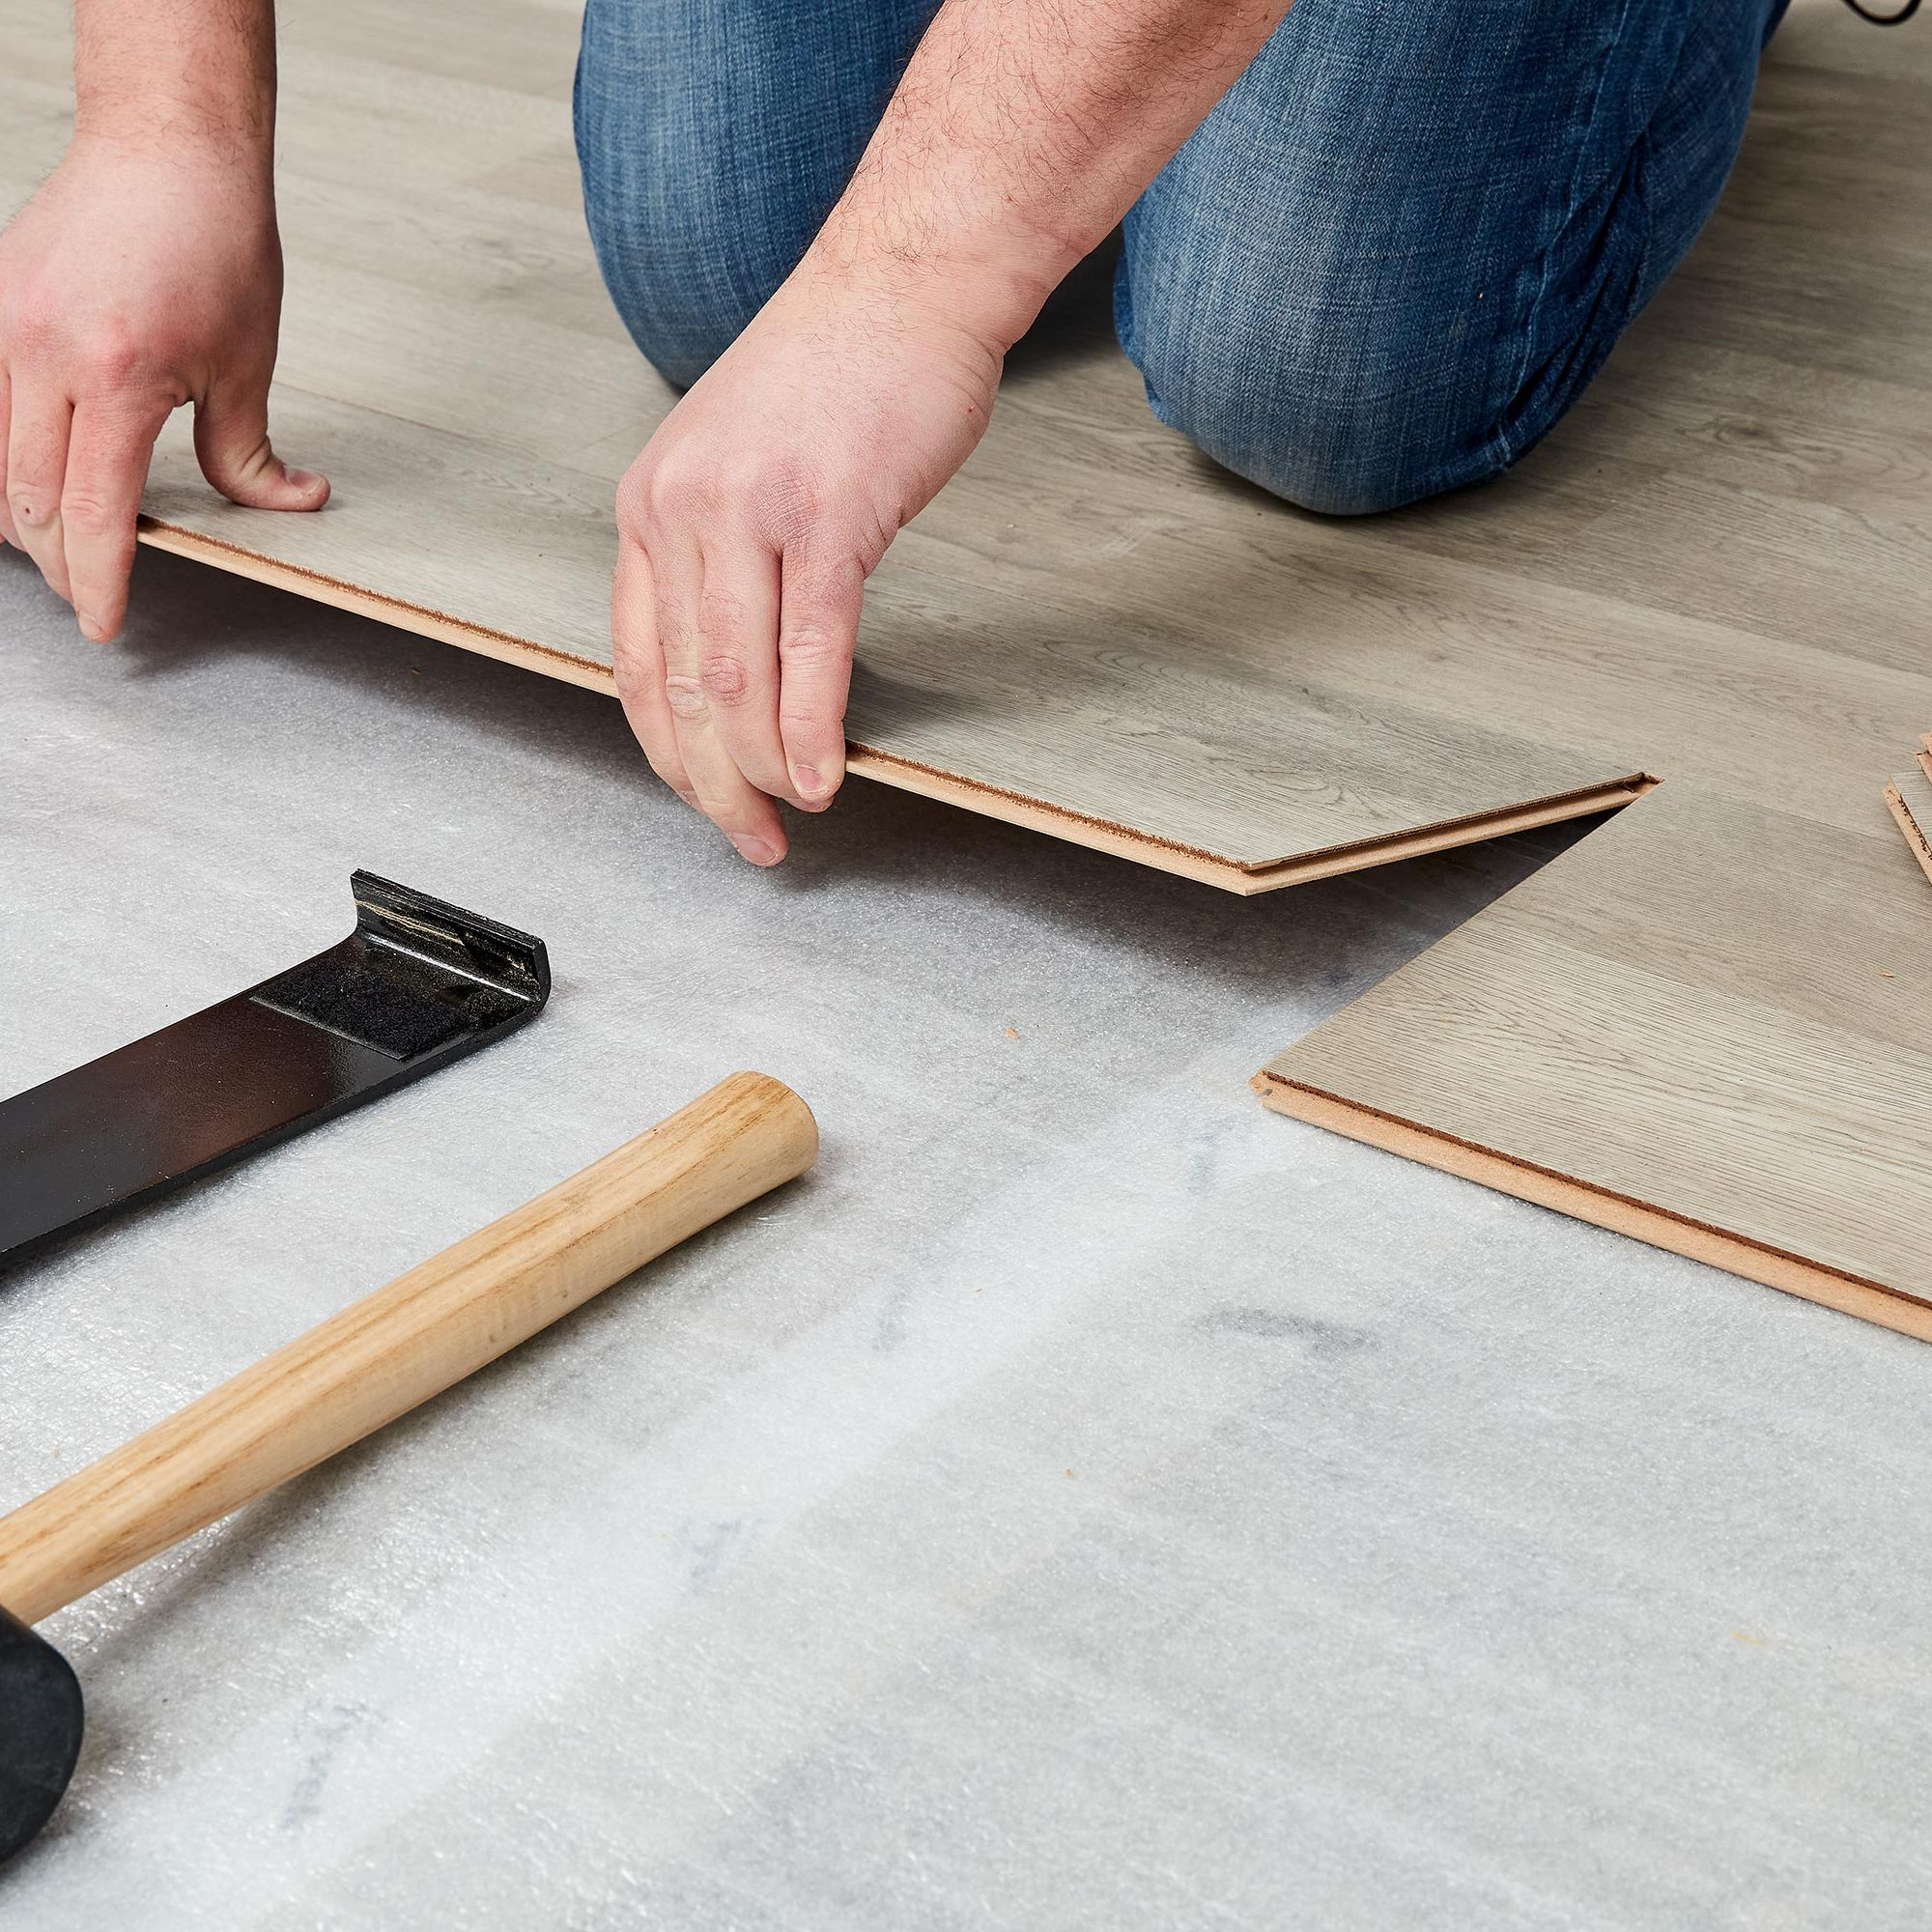 Laminate Underlayment Installation Basics, What Type Of Underlayment For Laminate Flooring On Concrete